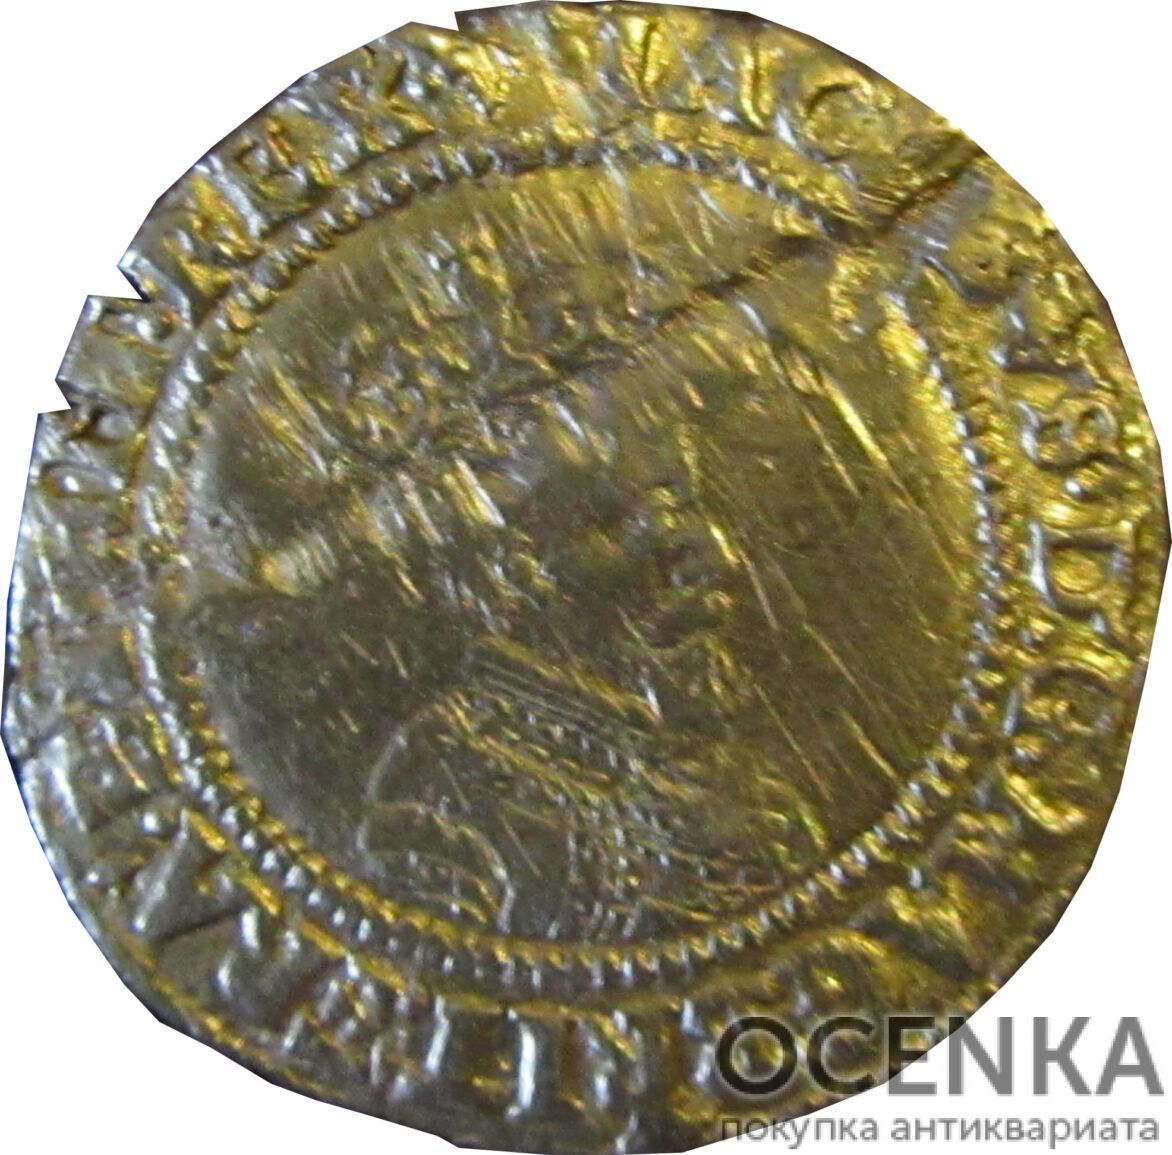 Золотая монета 1 Crown (крона) Великобритания - 6